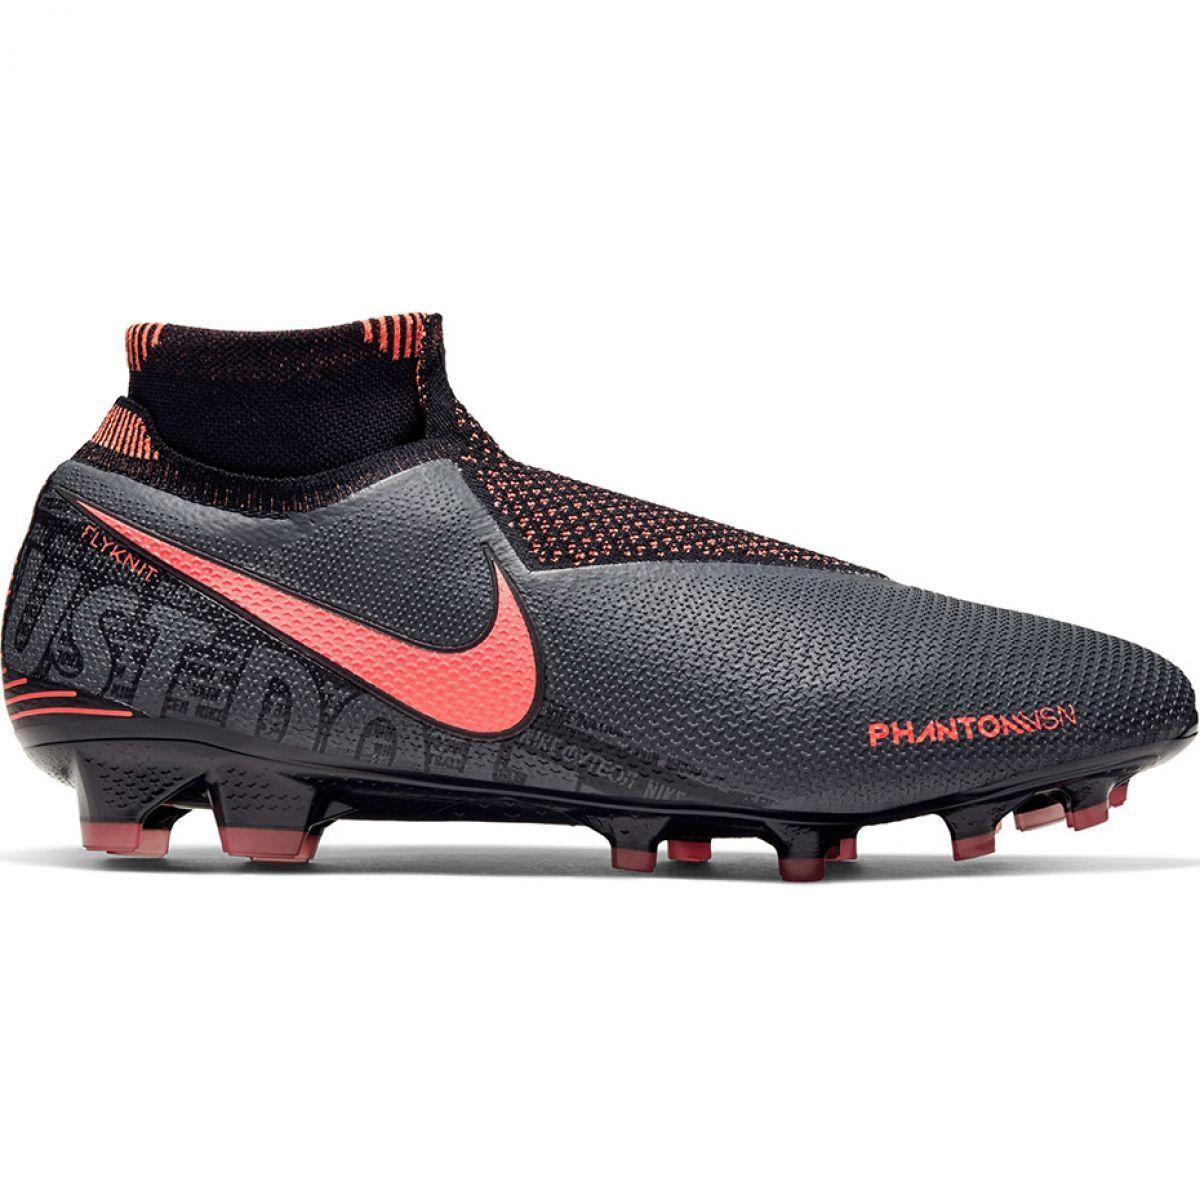 Buty Pilkarskie Nike Phantom Vsn Elite Df Fg M Ao3262 080 Czarne Wielokolorowe Football Shoes Mens Football Boots Nike